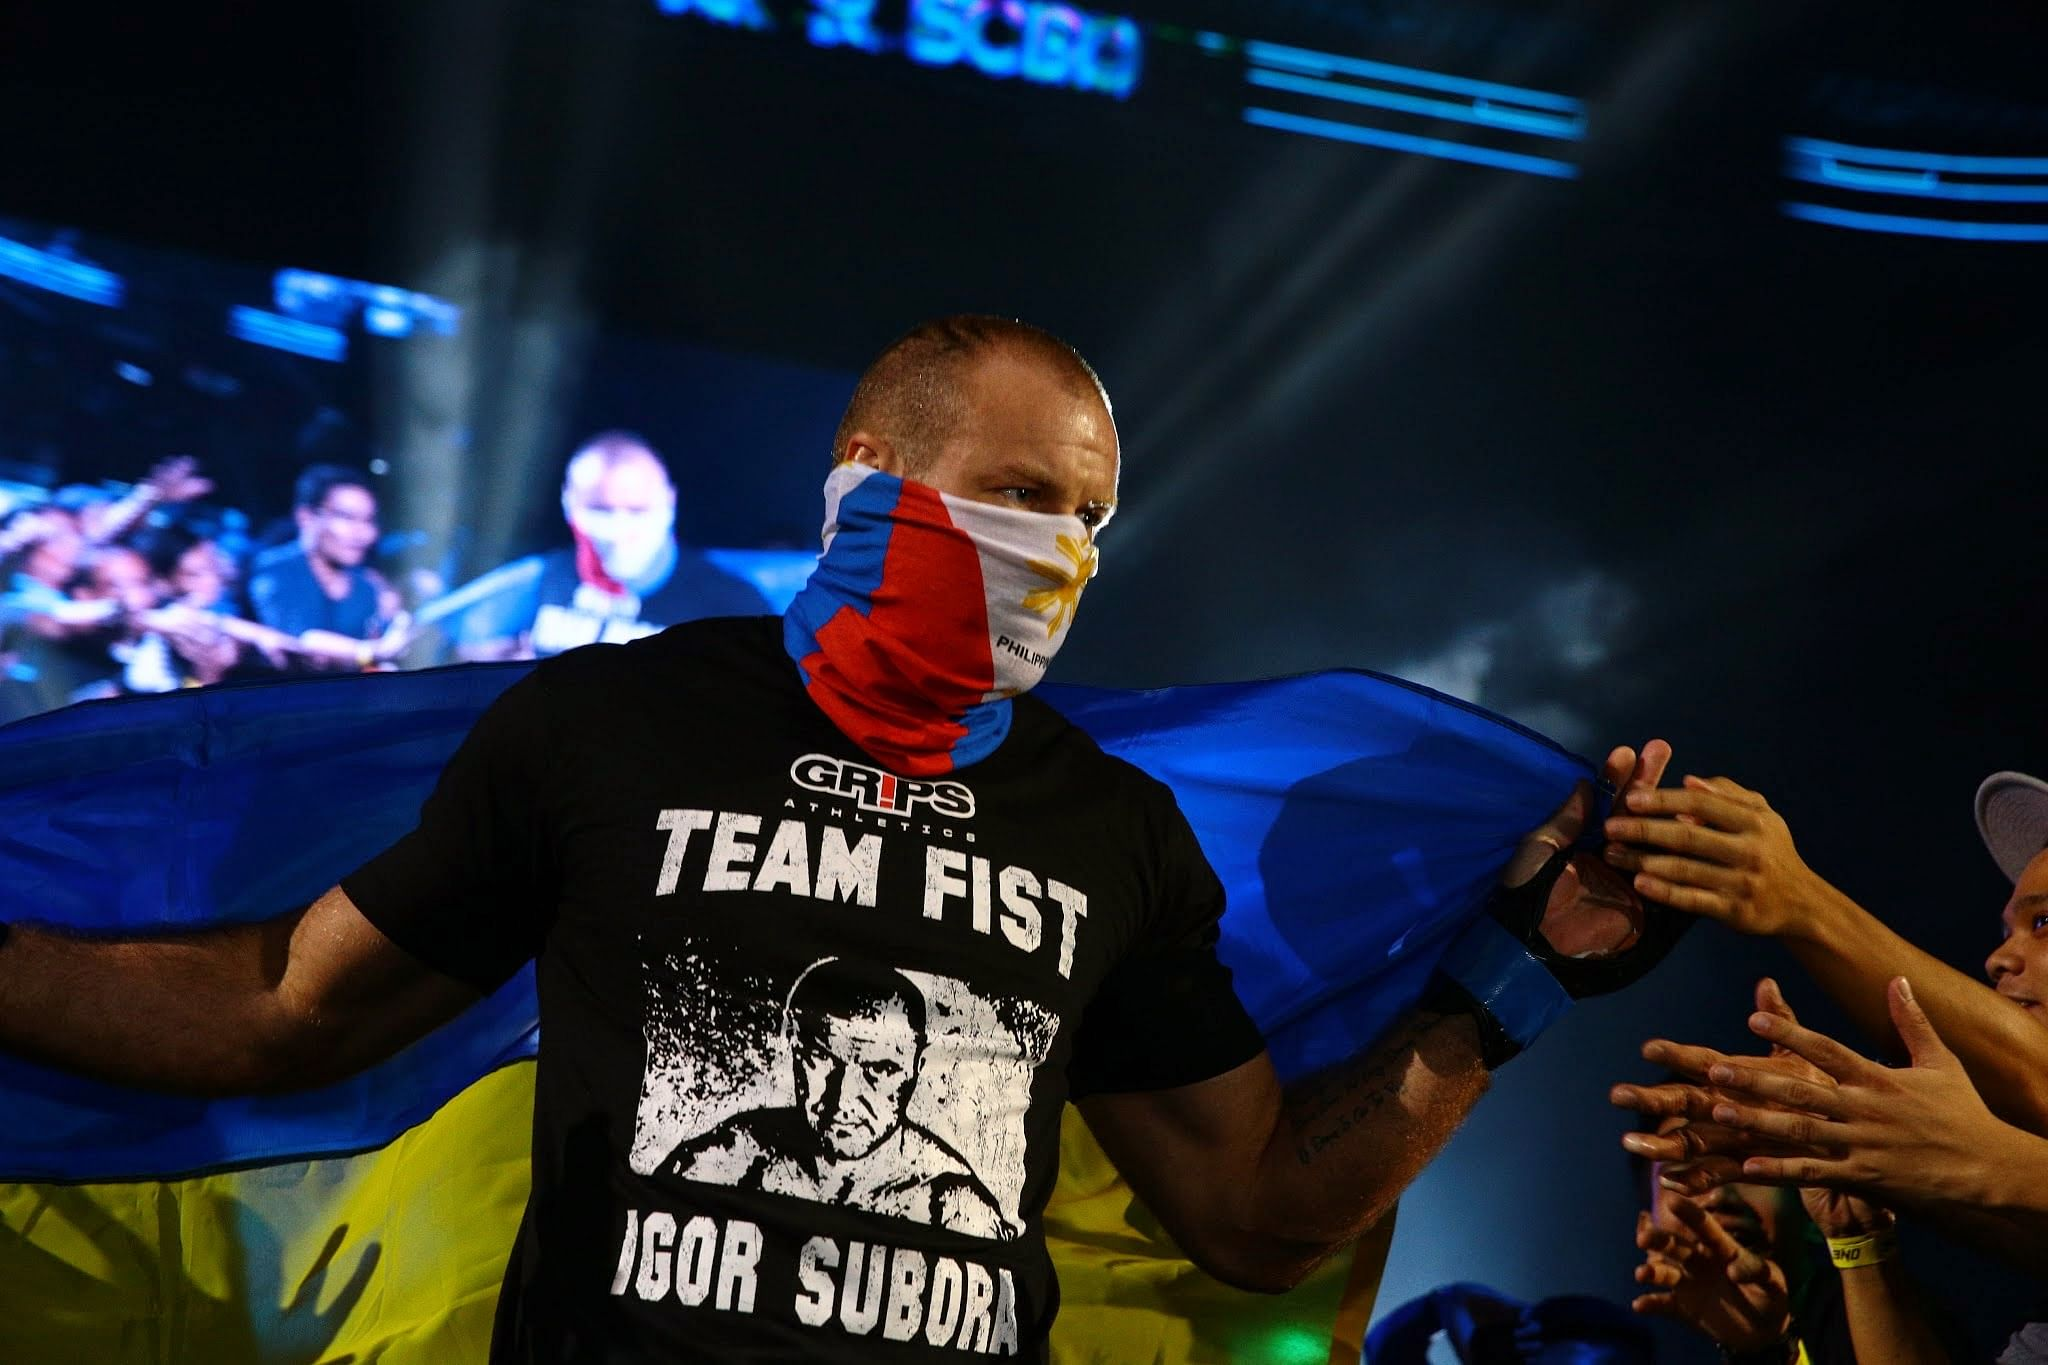 Igor Subora ready to prove himself